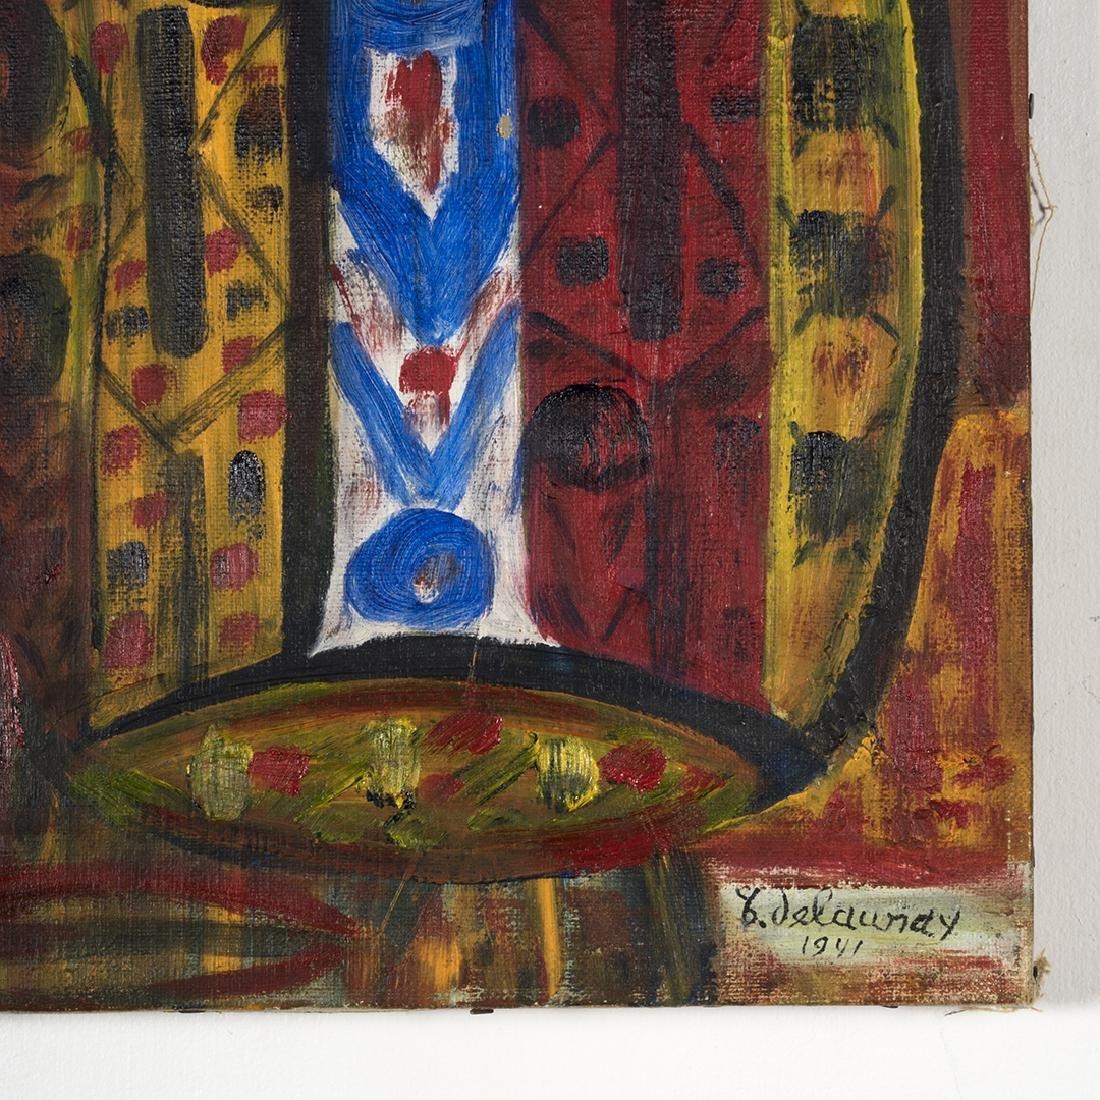 R. Delaunay Abstract - 2